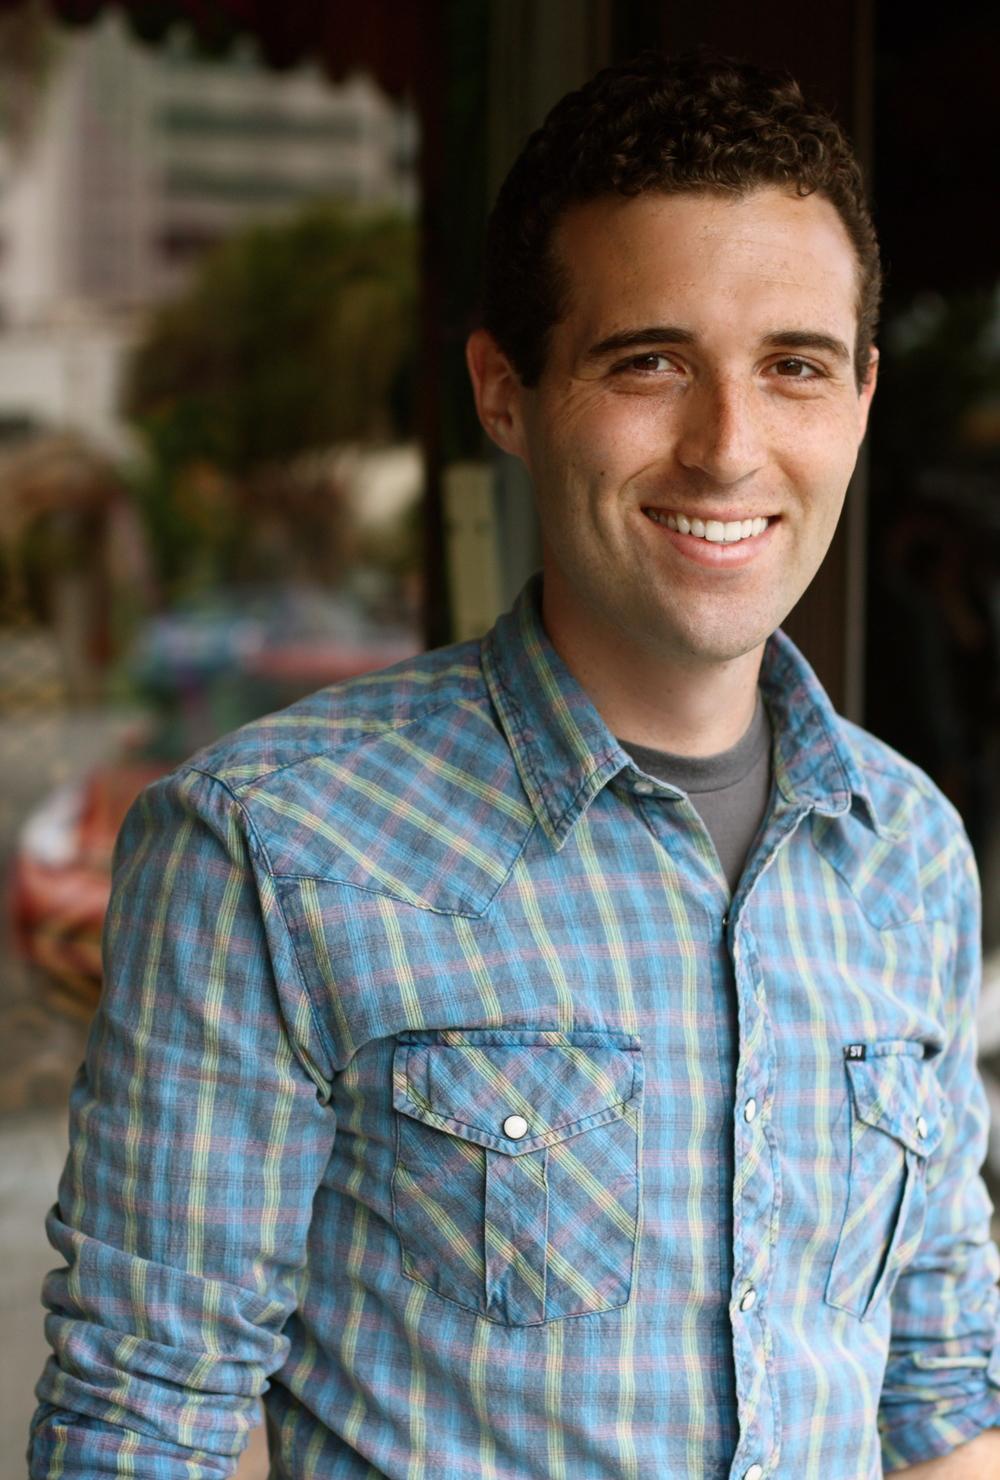 Michael Callahan - Director & Writer